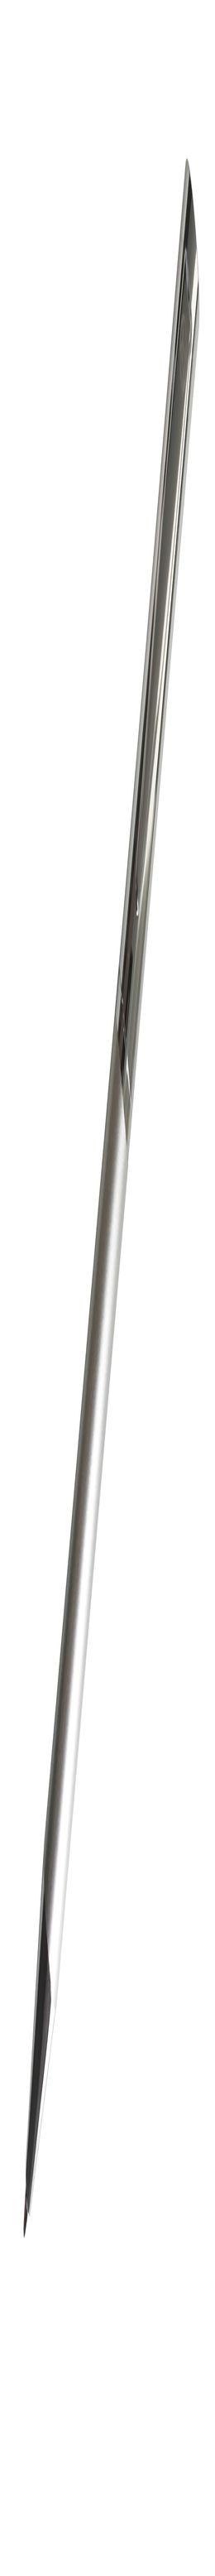 Ручка шариковая JAZZY фото